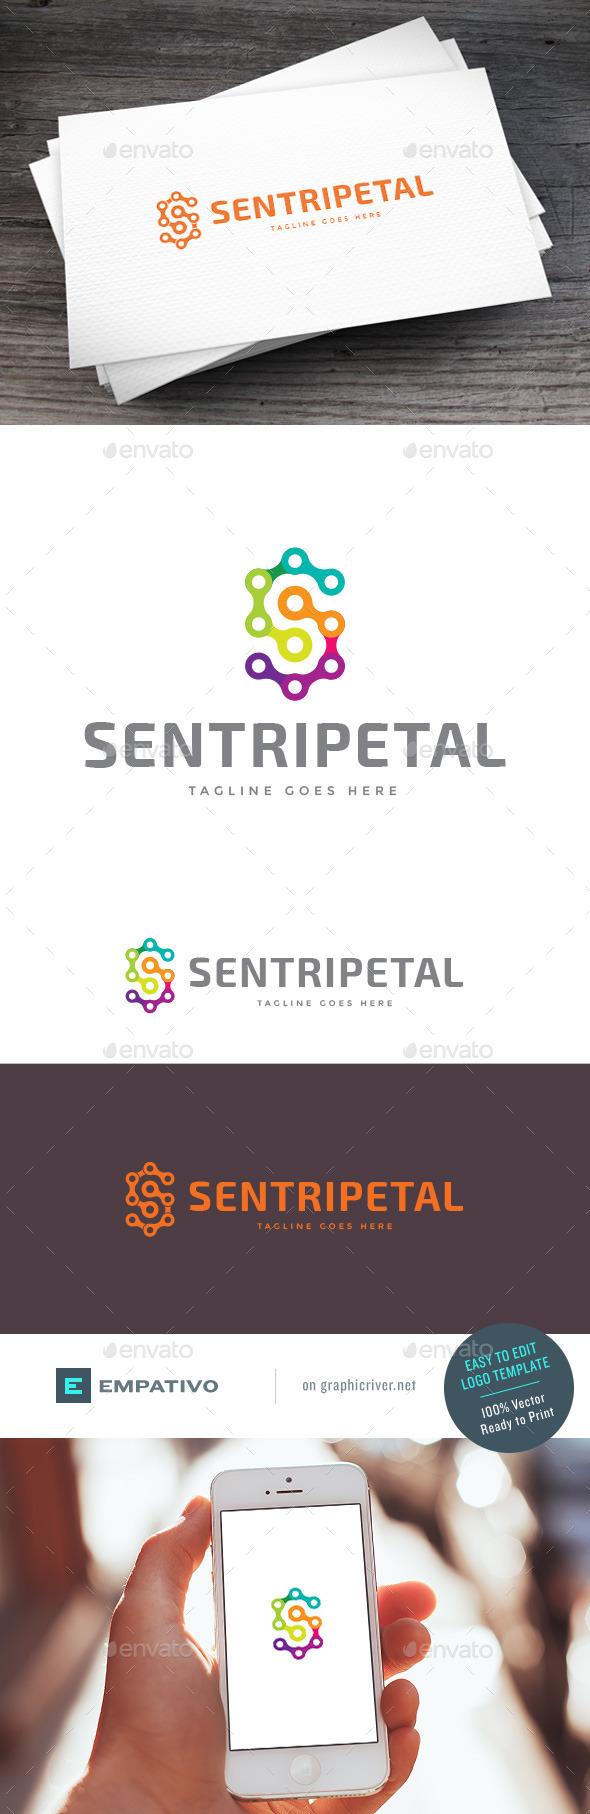 GraphicRiver Sentripetal Logo Template 11100988